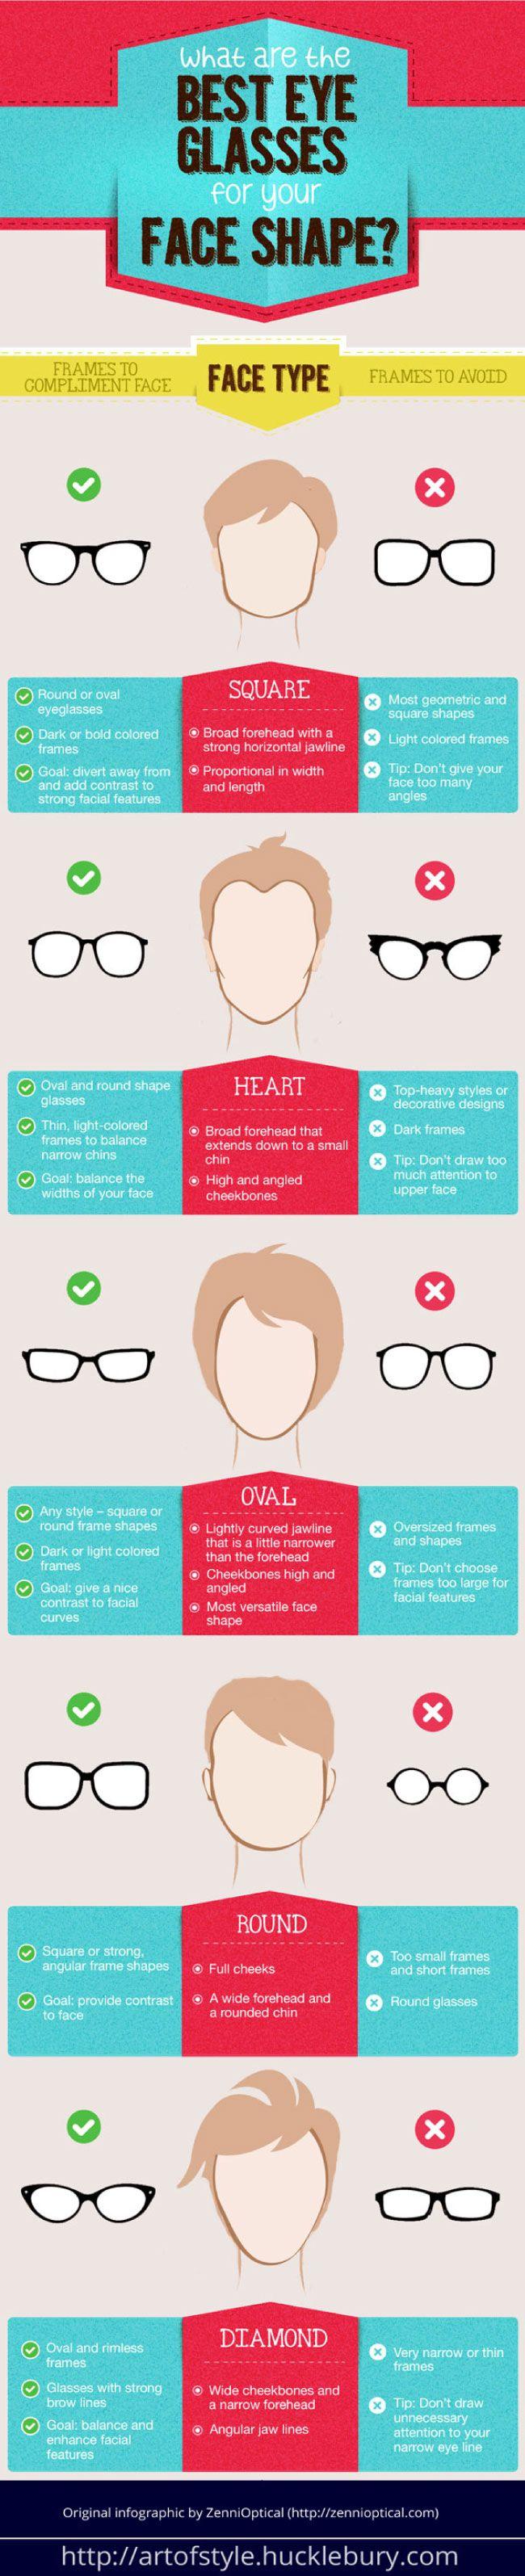 25+ best ideas about Best glasses for men on Pinterest ...